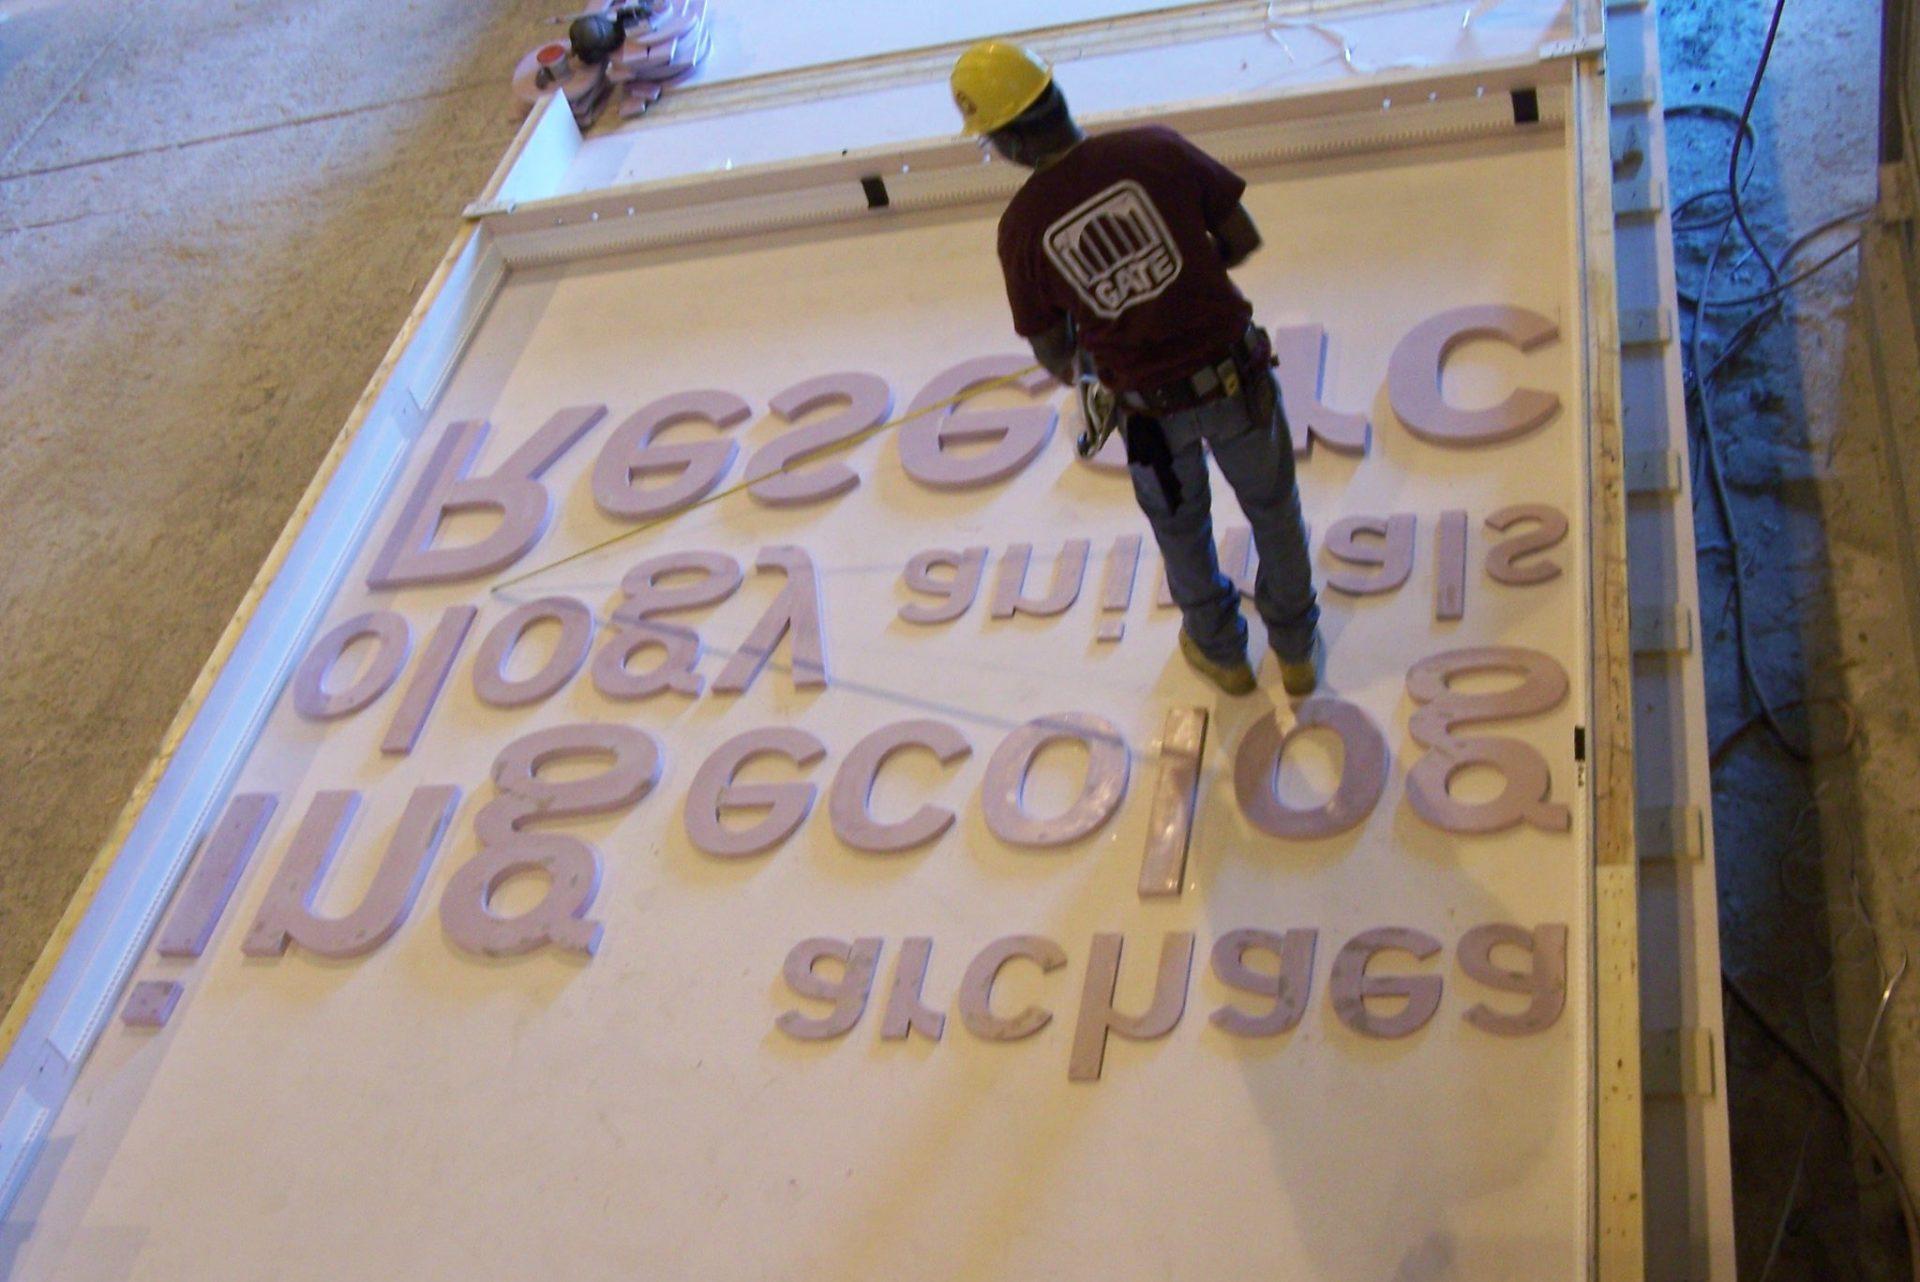 Gate worker setting up precast concrete letters